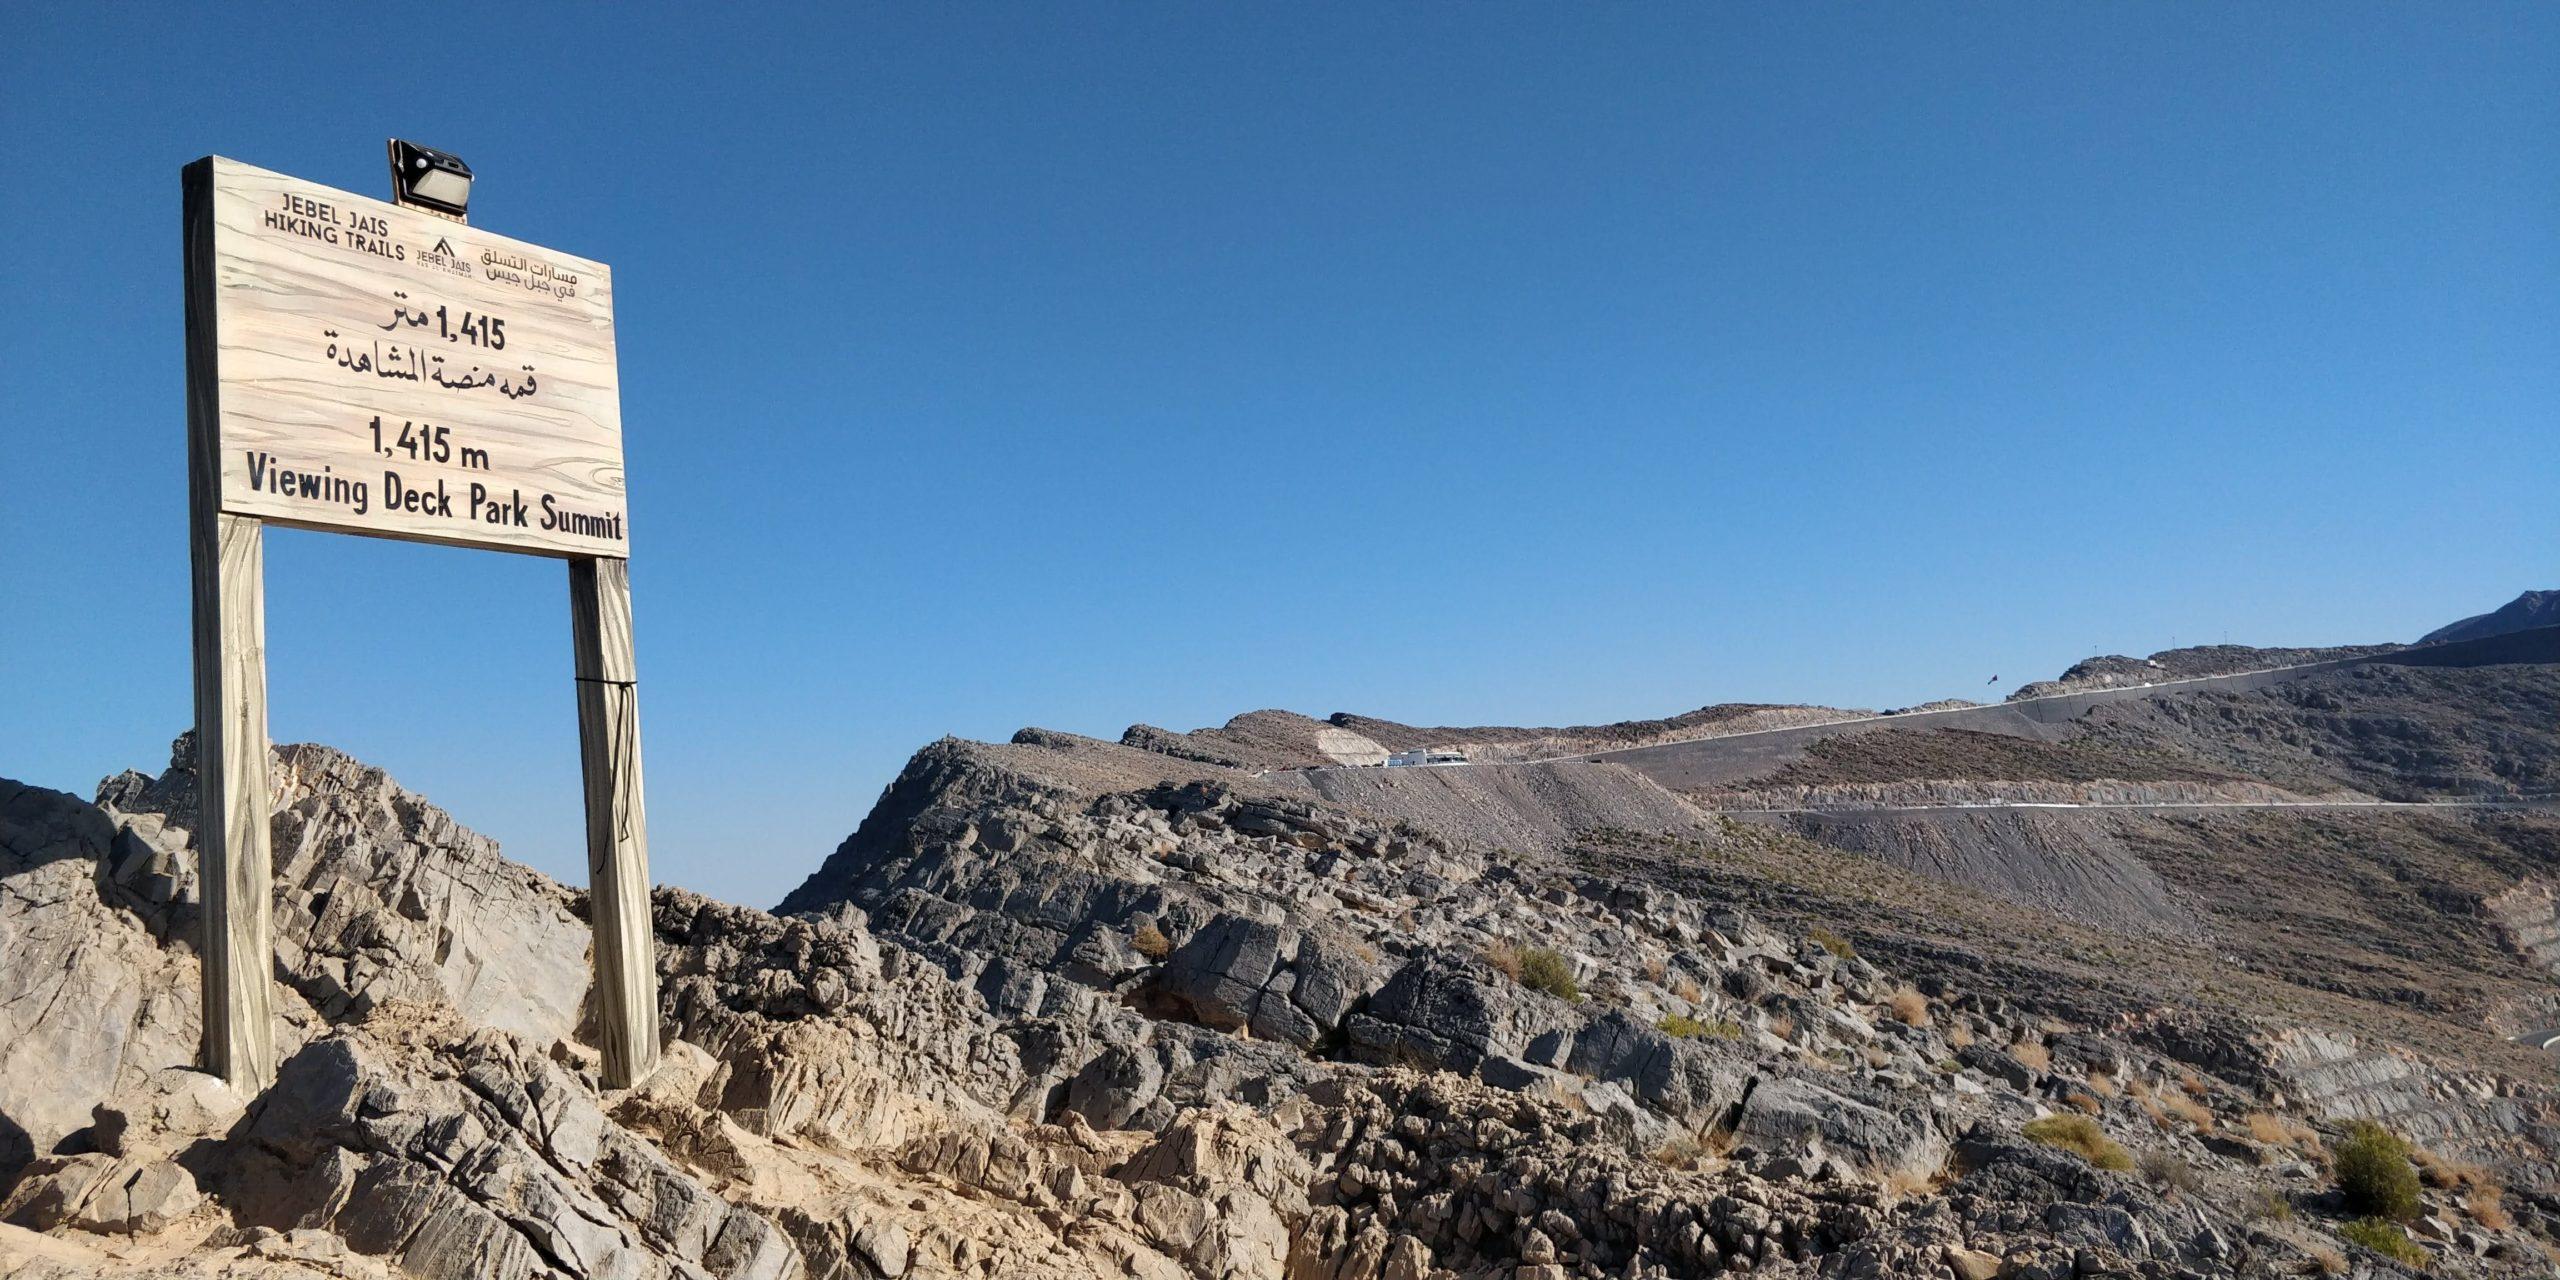 Jebal Jais Hiking Trails board overlooking the Al Hajar Mountains